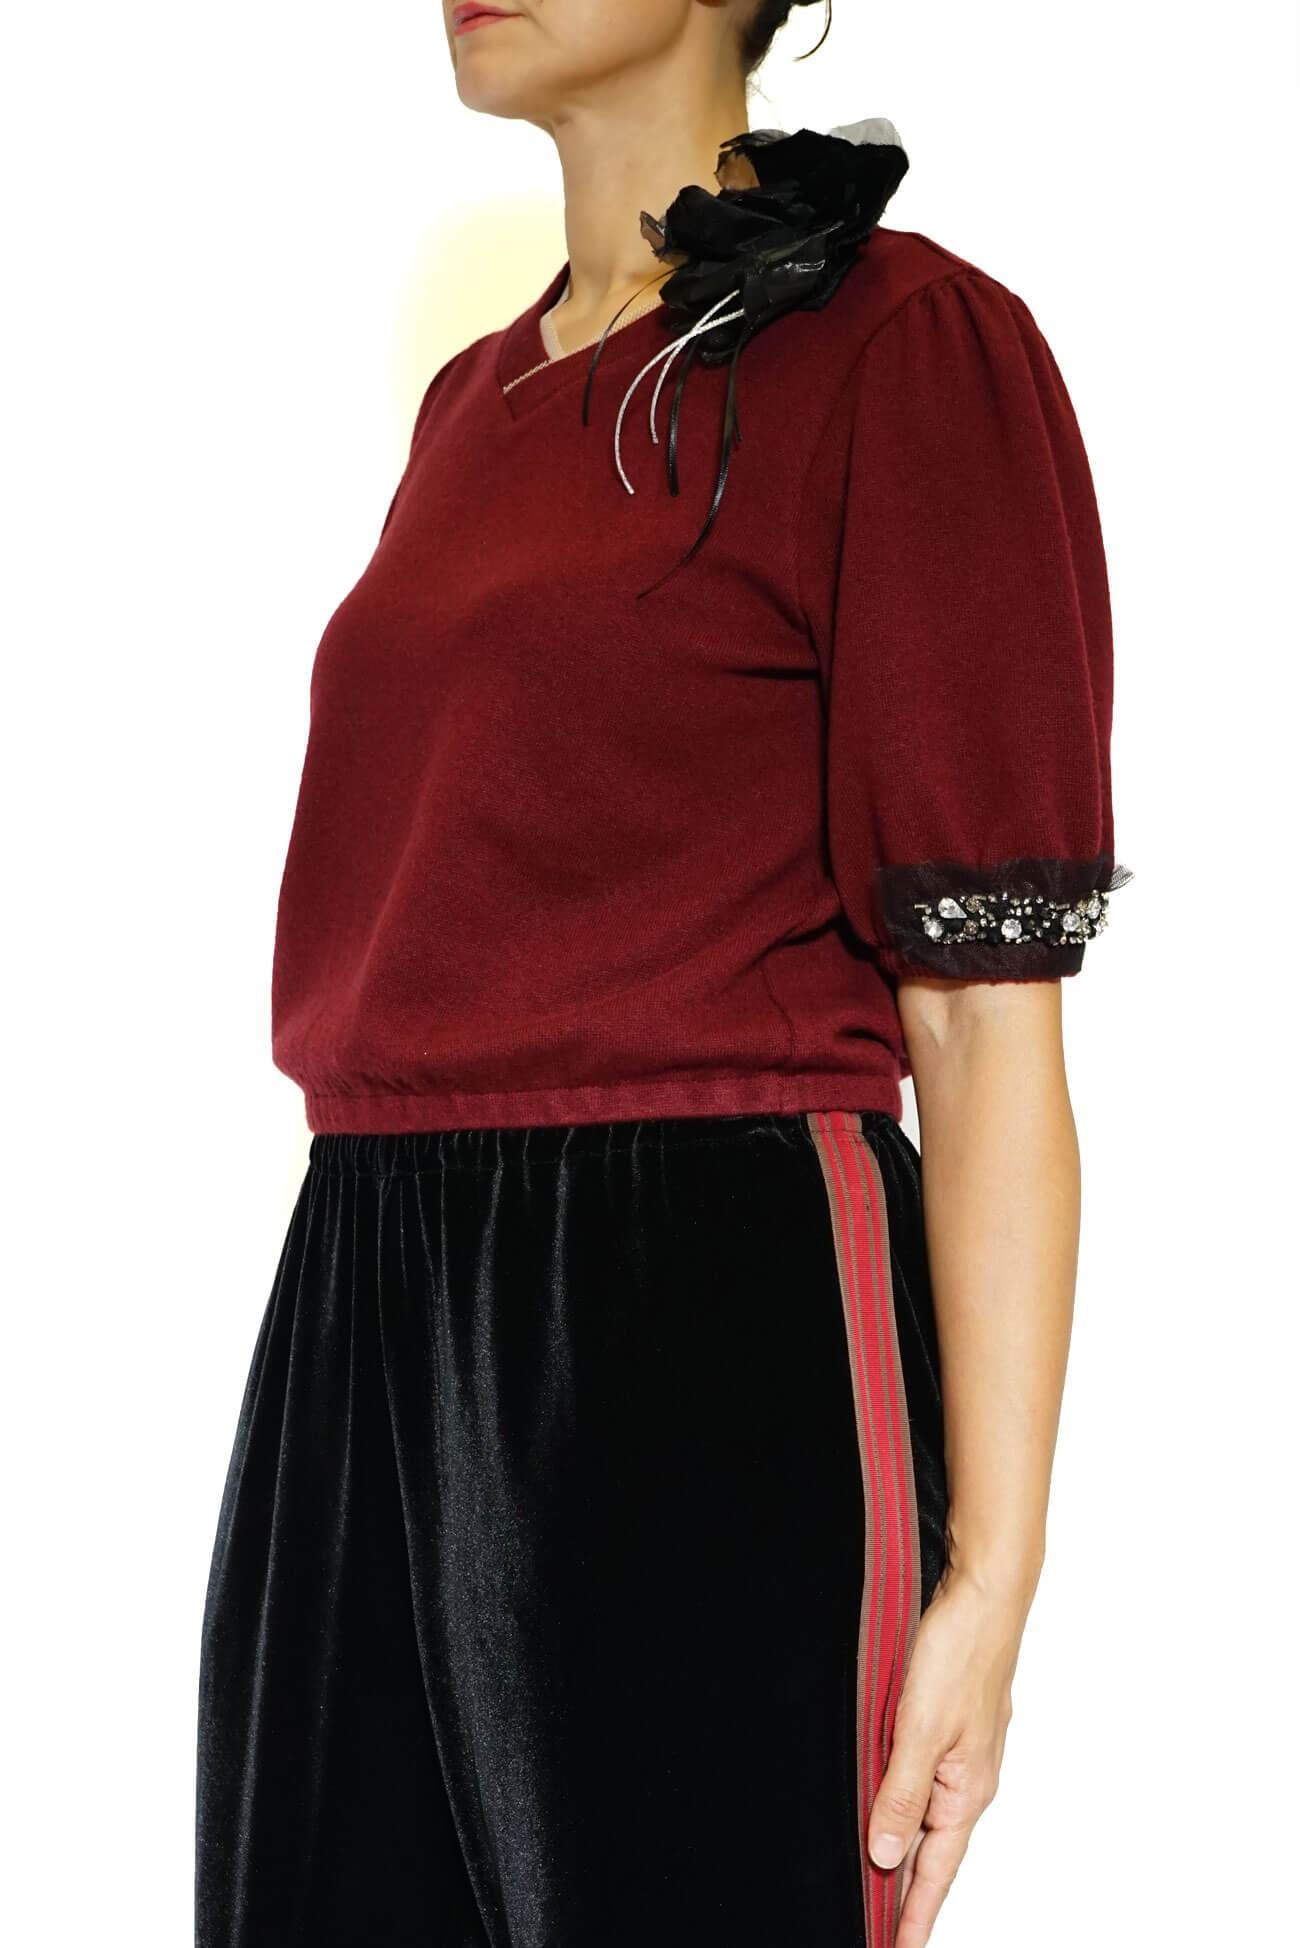 pulover grena cu anchior si aplicatii pe maneca(  produs la precomanda  )